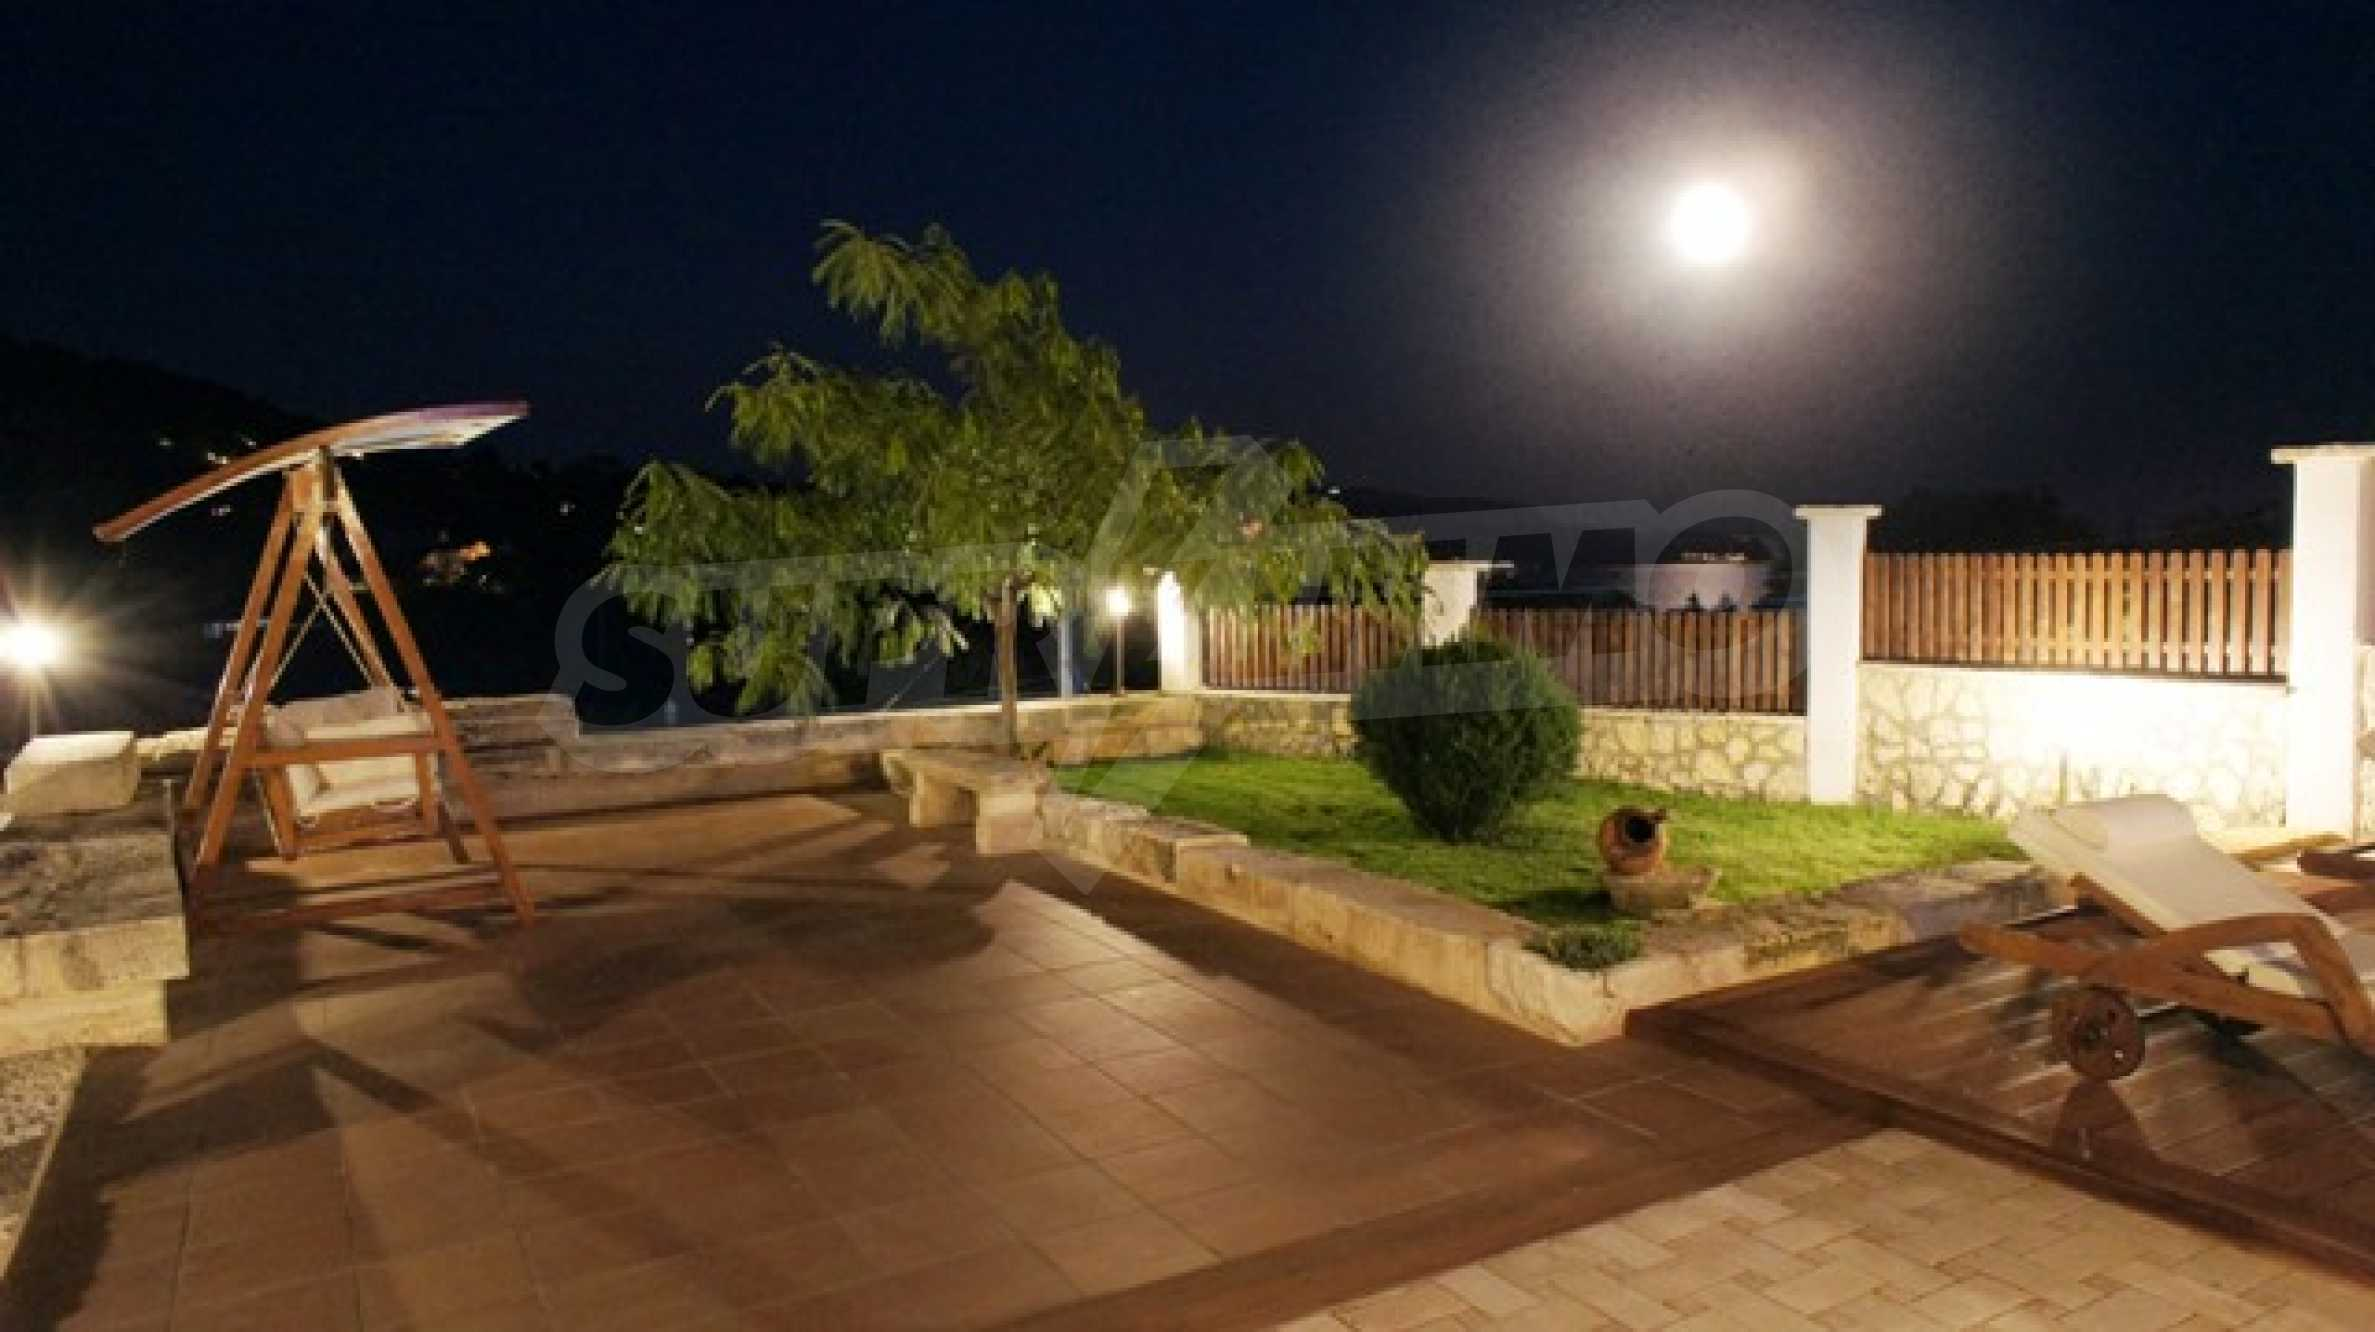 The Mediterranean style - a sense of luxury 64